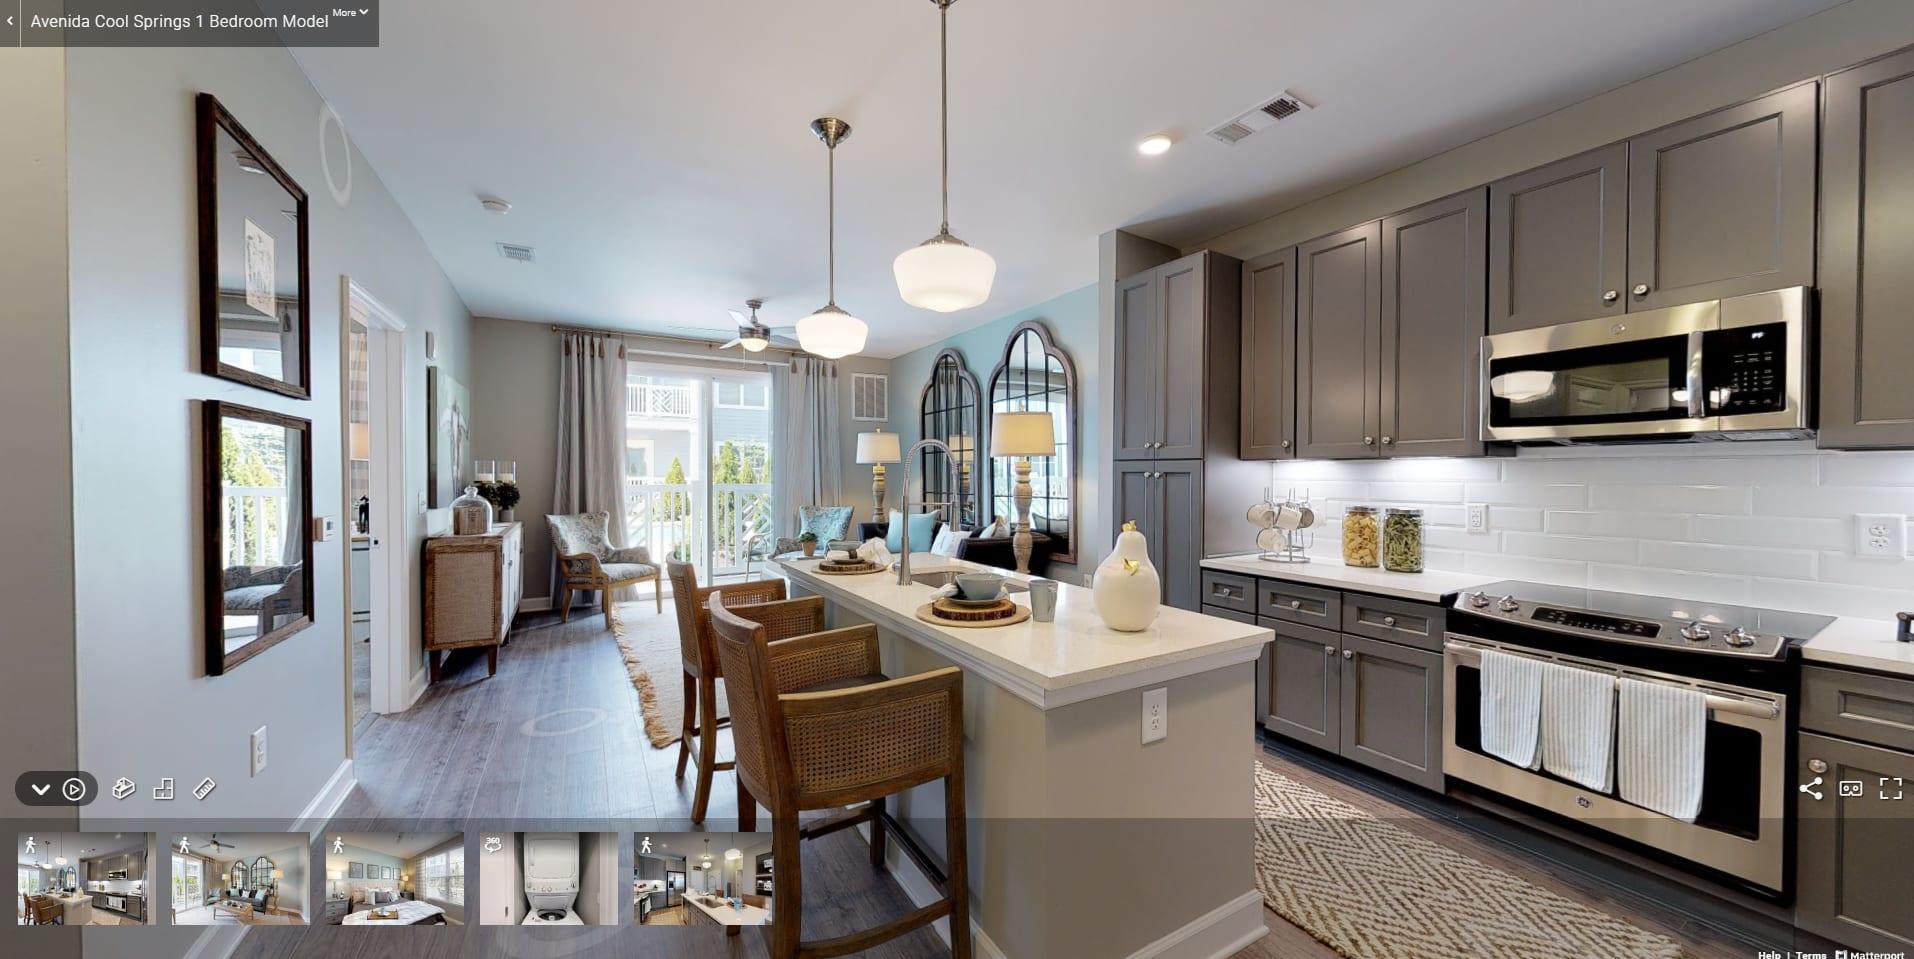 Modern Kitchen & Open Living Space at Avenida Cool Springs Active Senior Living in Franklin, TN